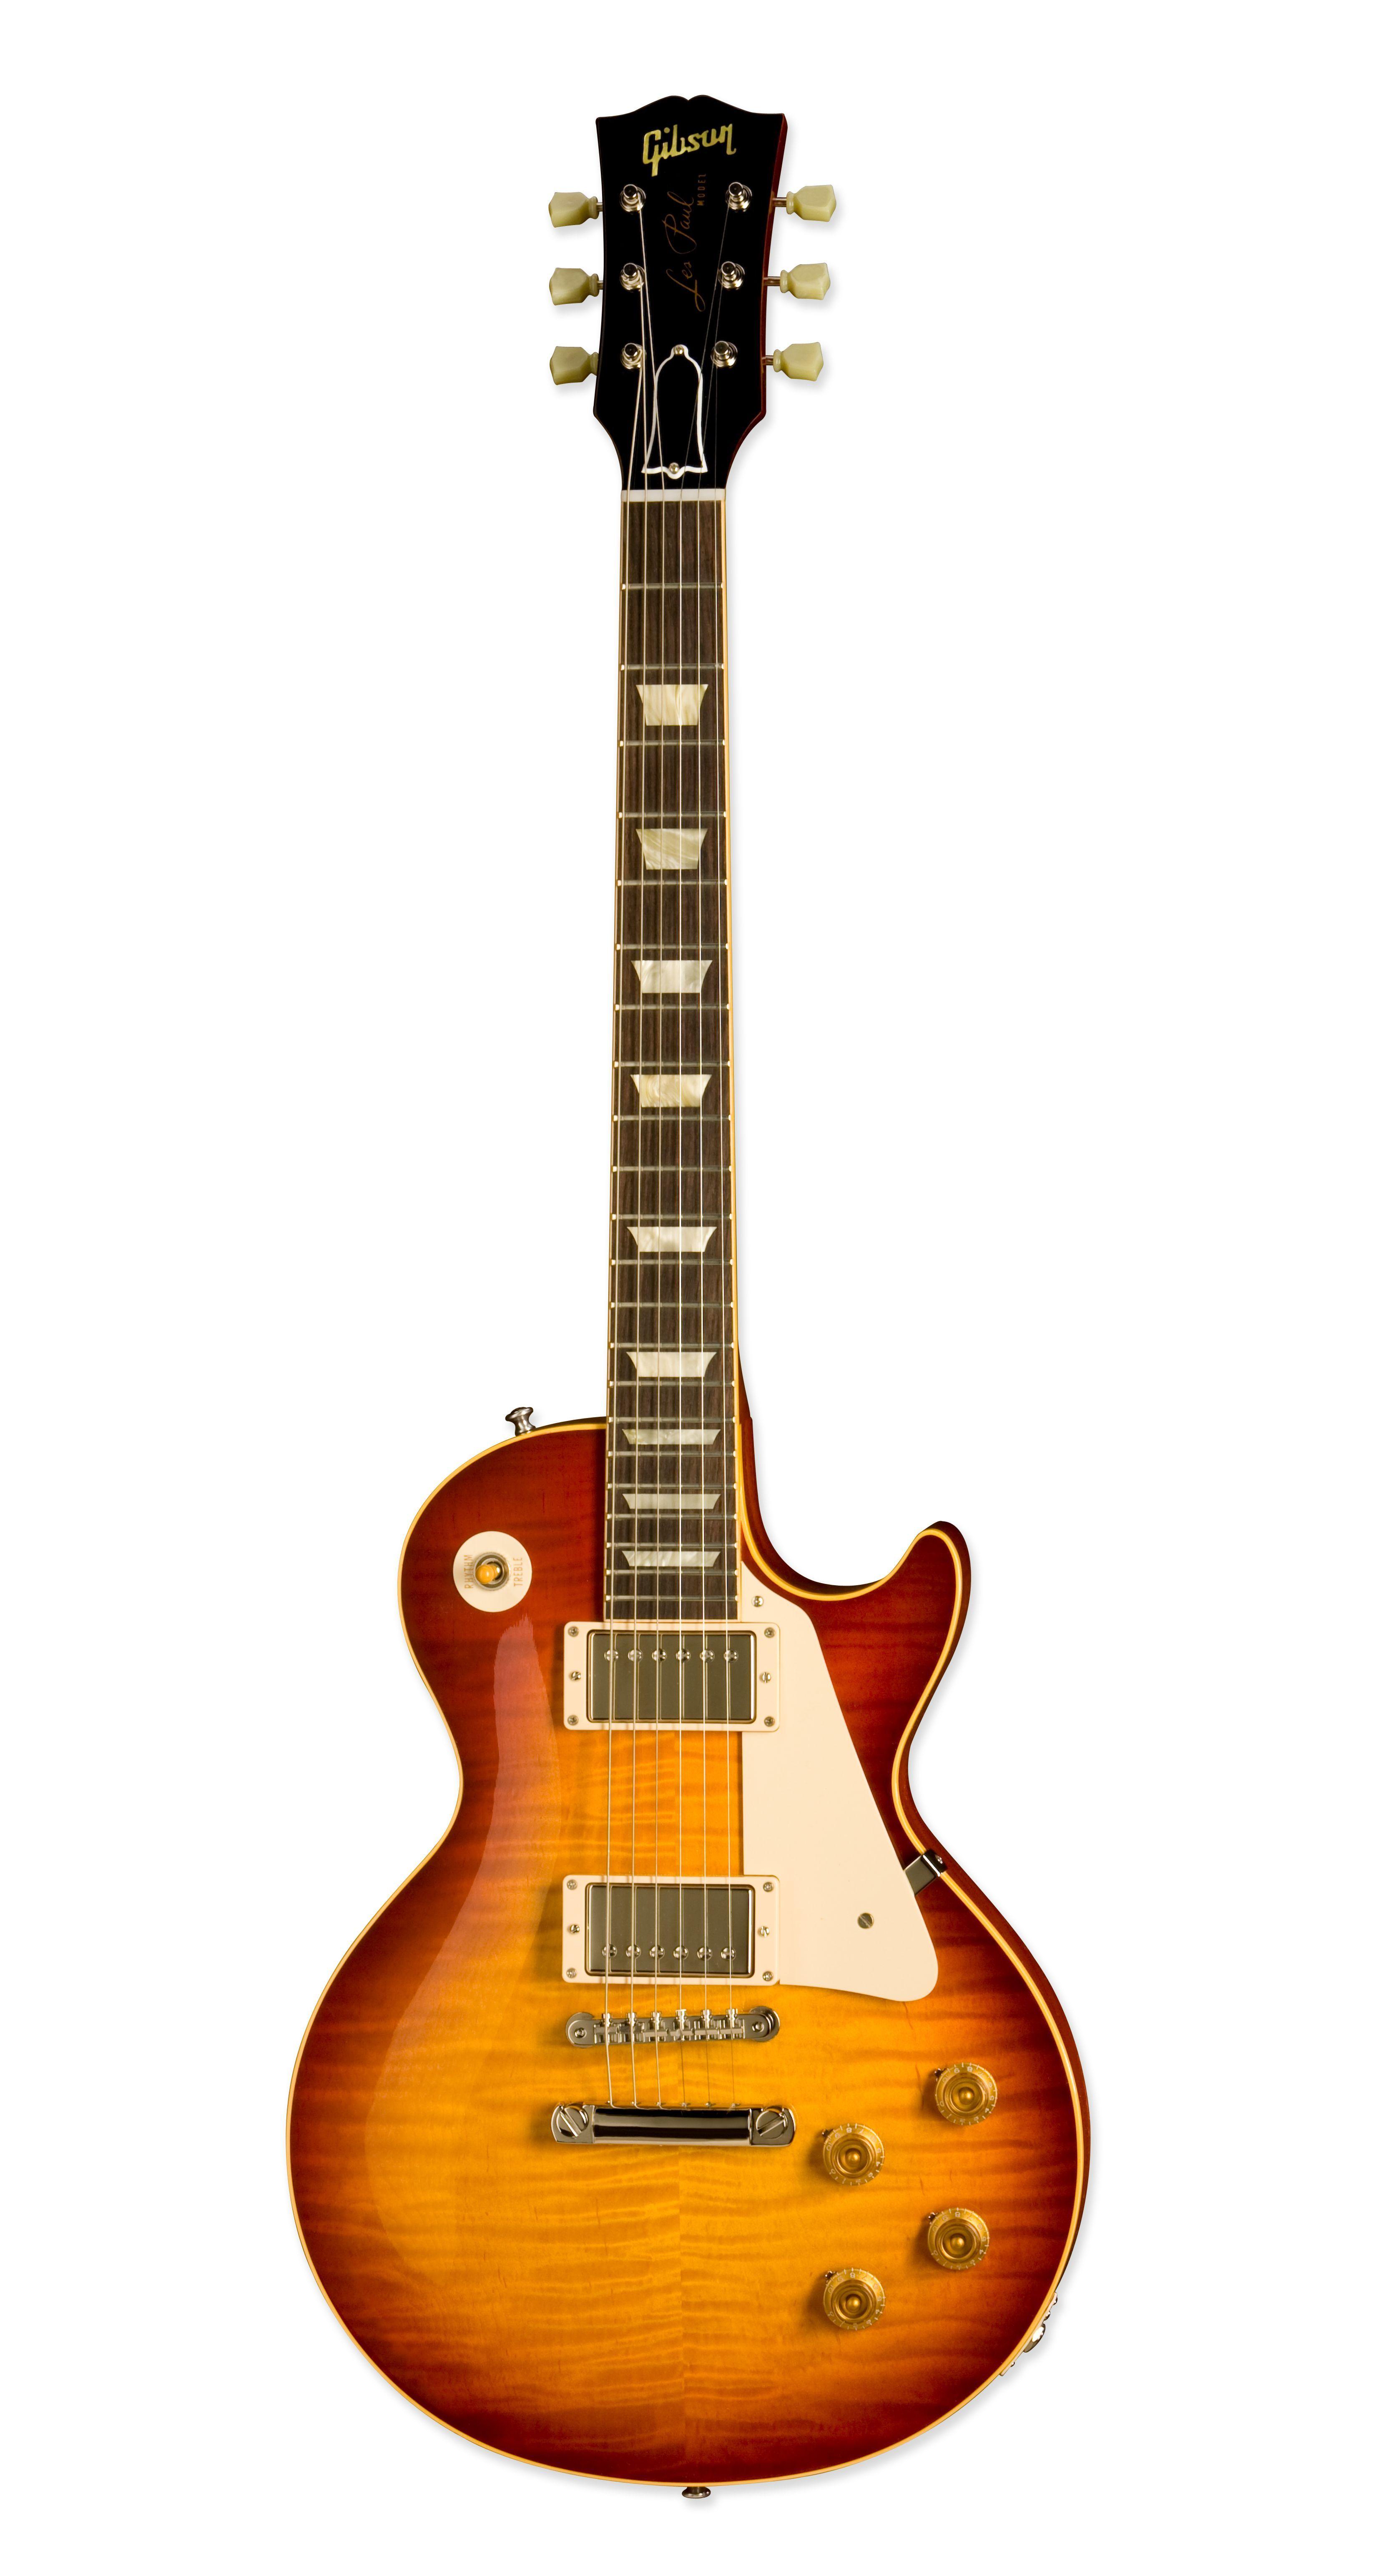 gibson guitars new models | Les Paul | Gibson guitars